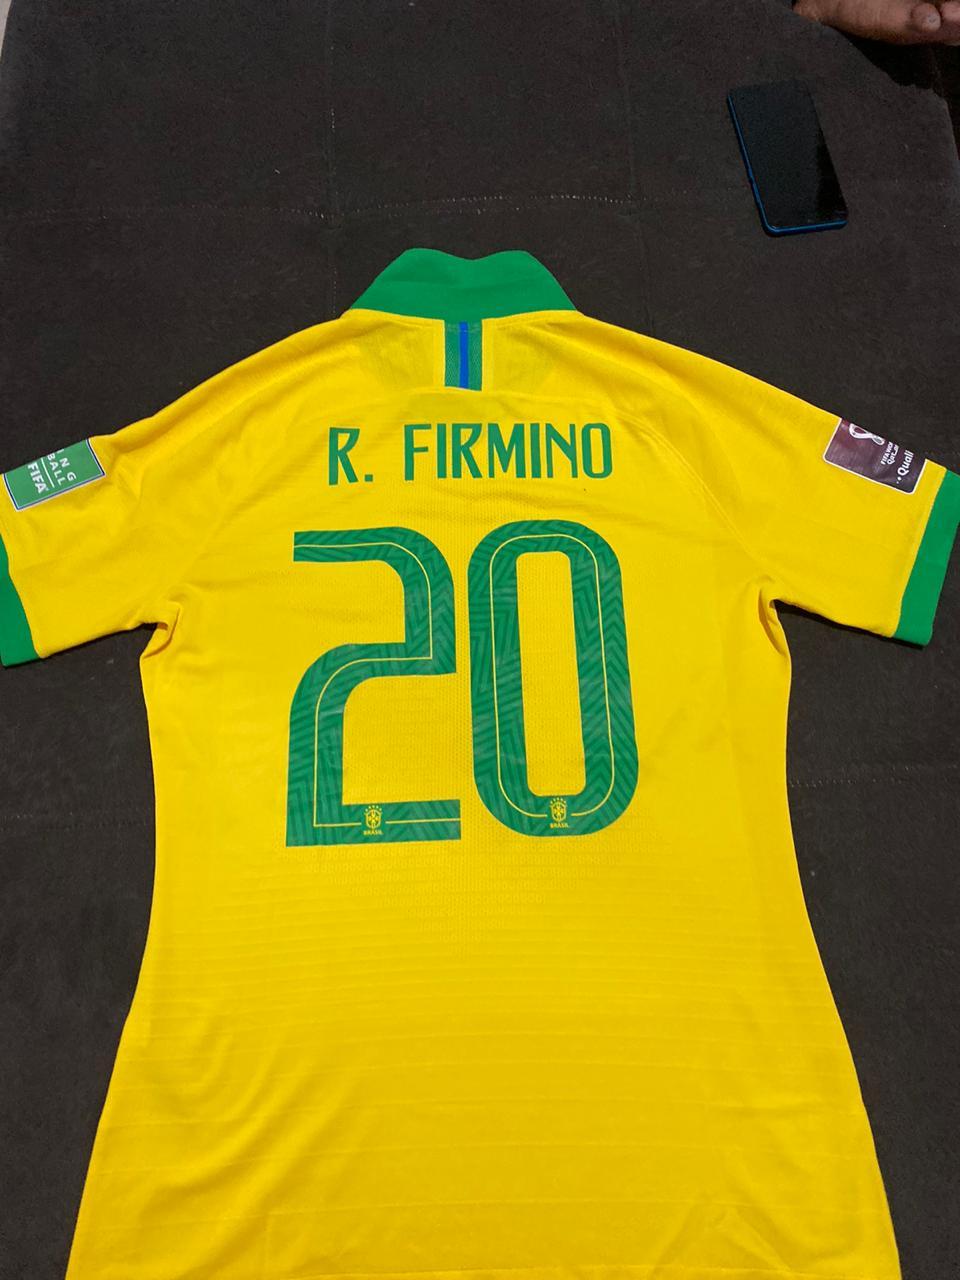 Foto  - @amejoaoguilherme  - Camisa autografada FIRMINO  (Liverpool)